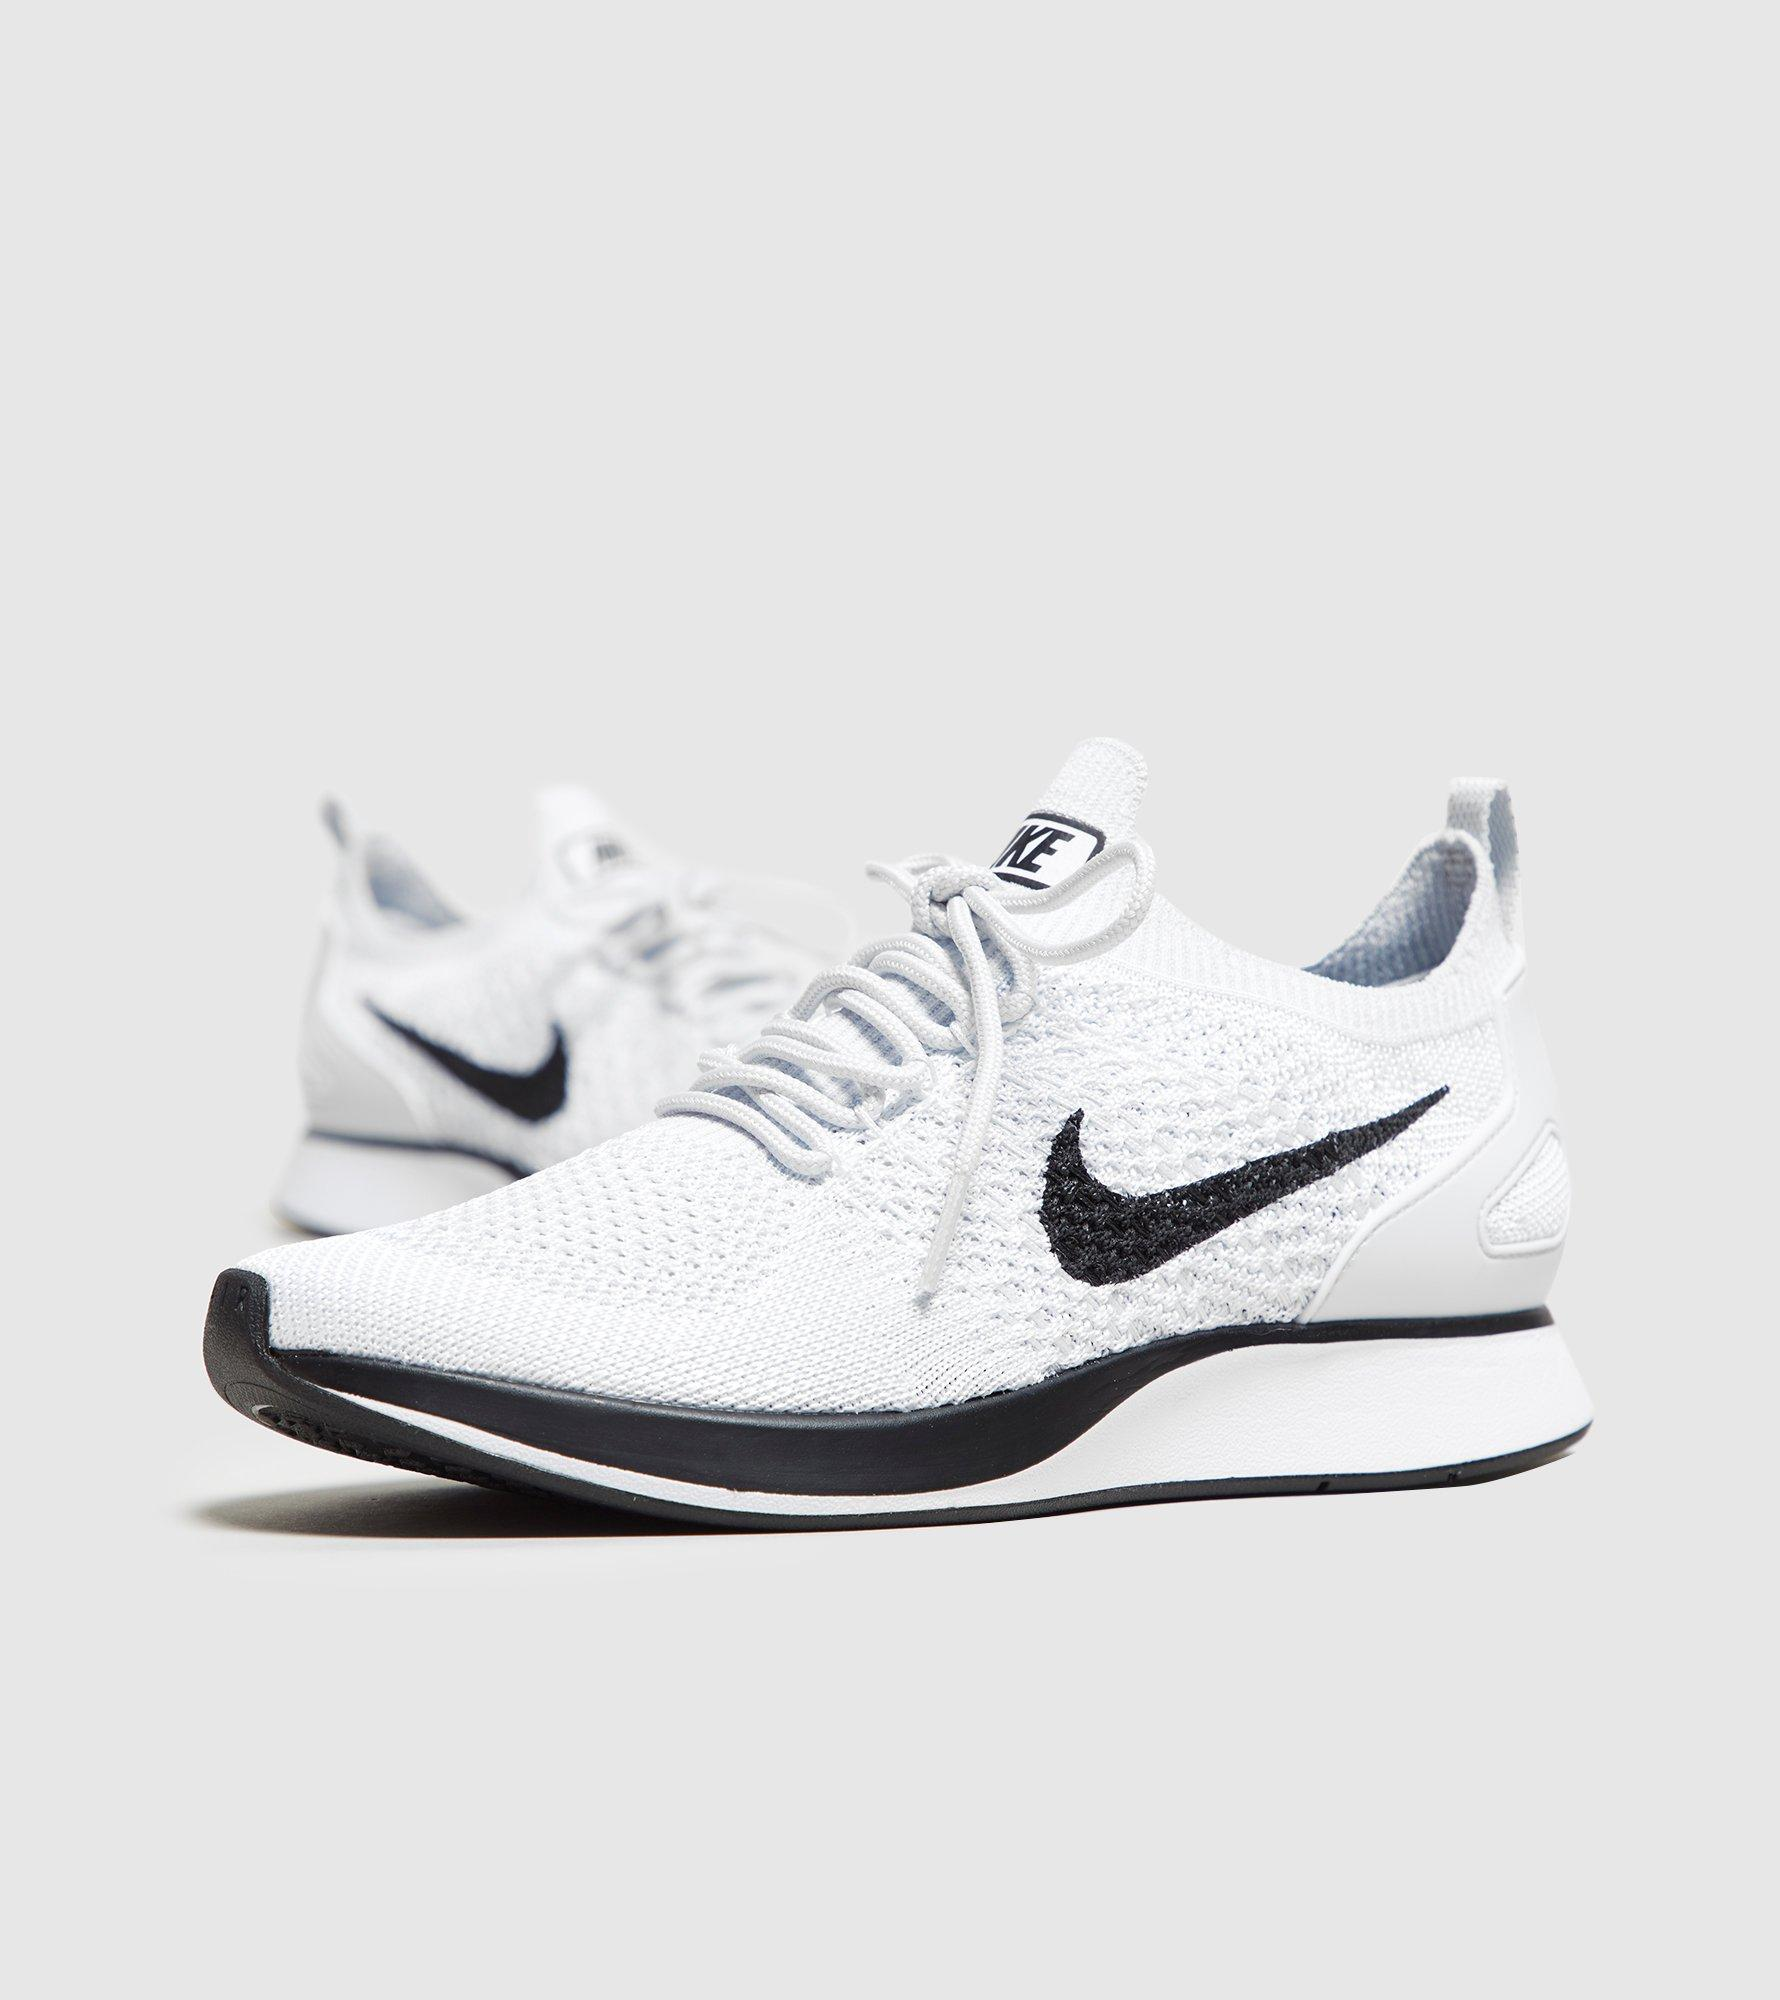 79c3d0a9018a3 Lyst - Nike Air Zoom Mariah Flyknit Racerback Women s in White